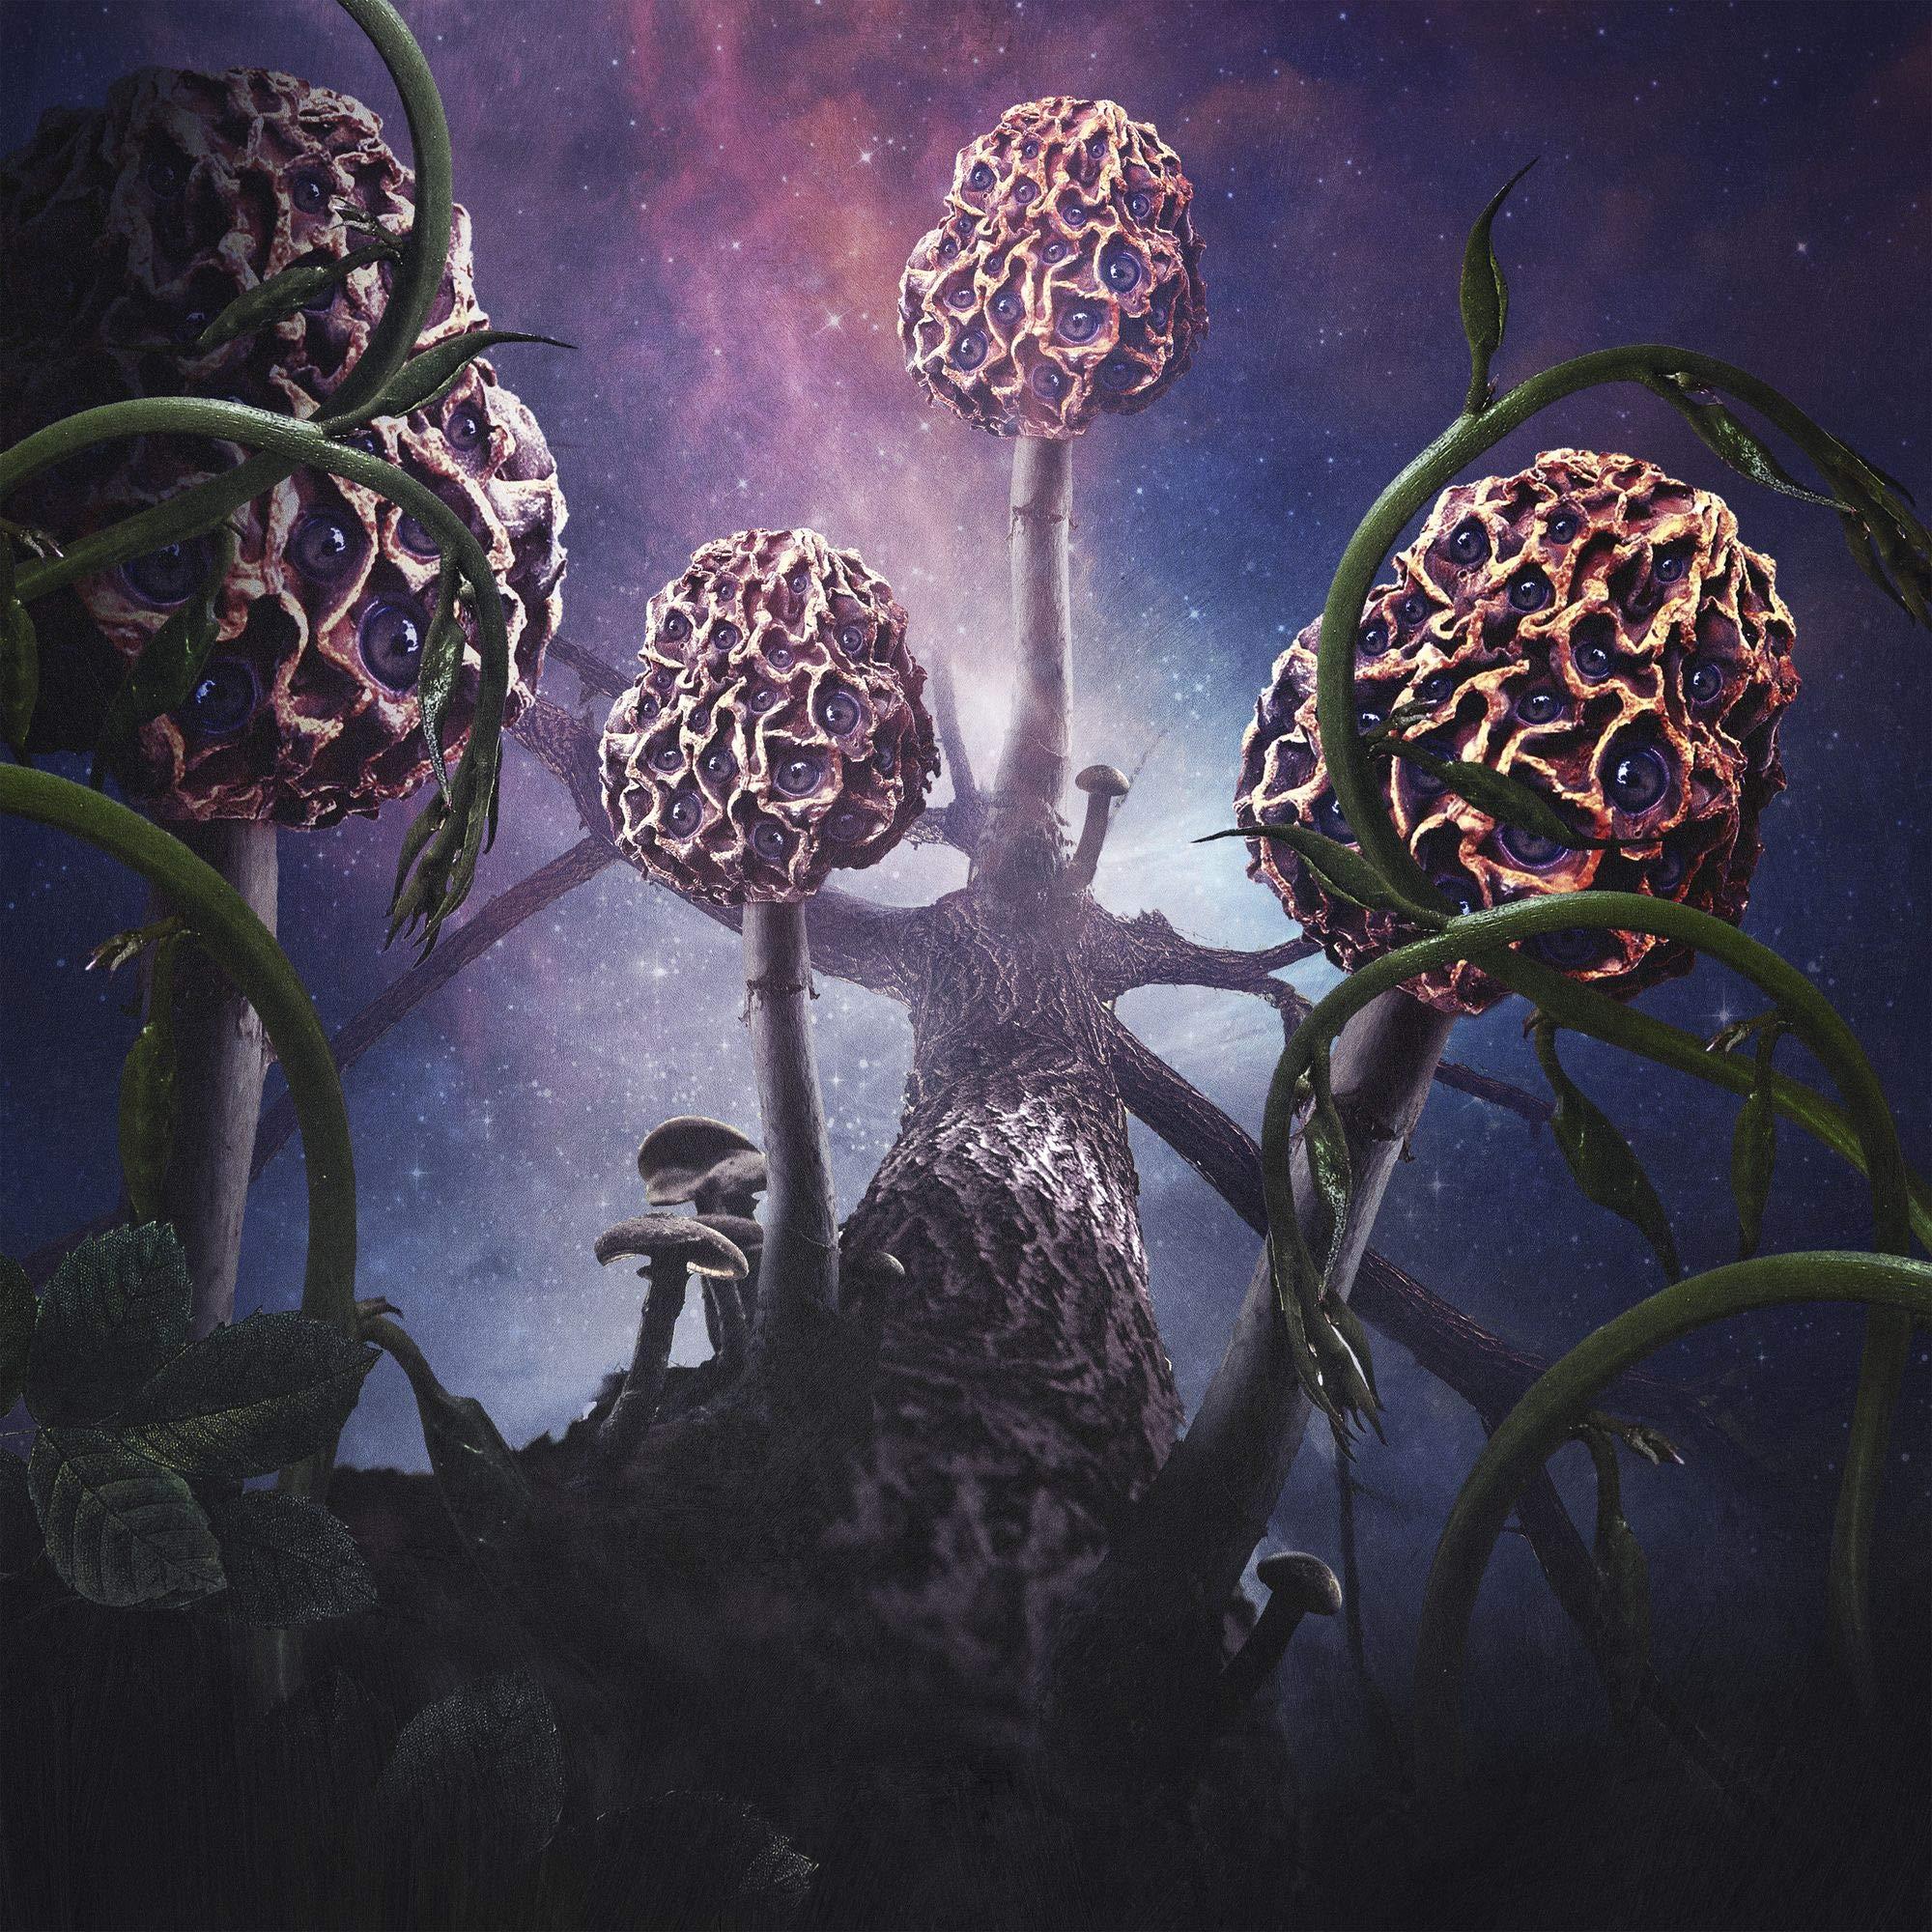 Hallucinogen (North American Exclusive Transparent Purple with Milky Merge 2LP) by Debemur Morti Productions